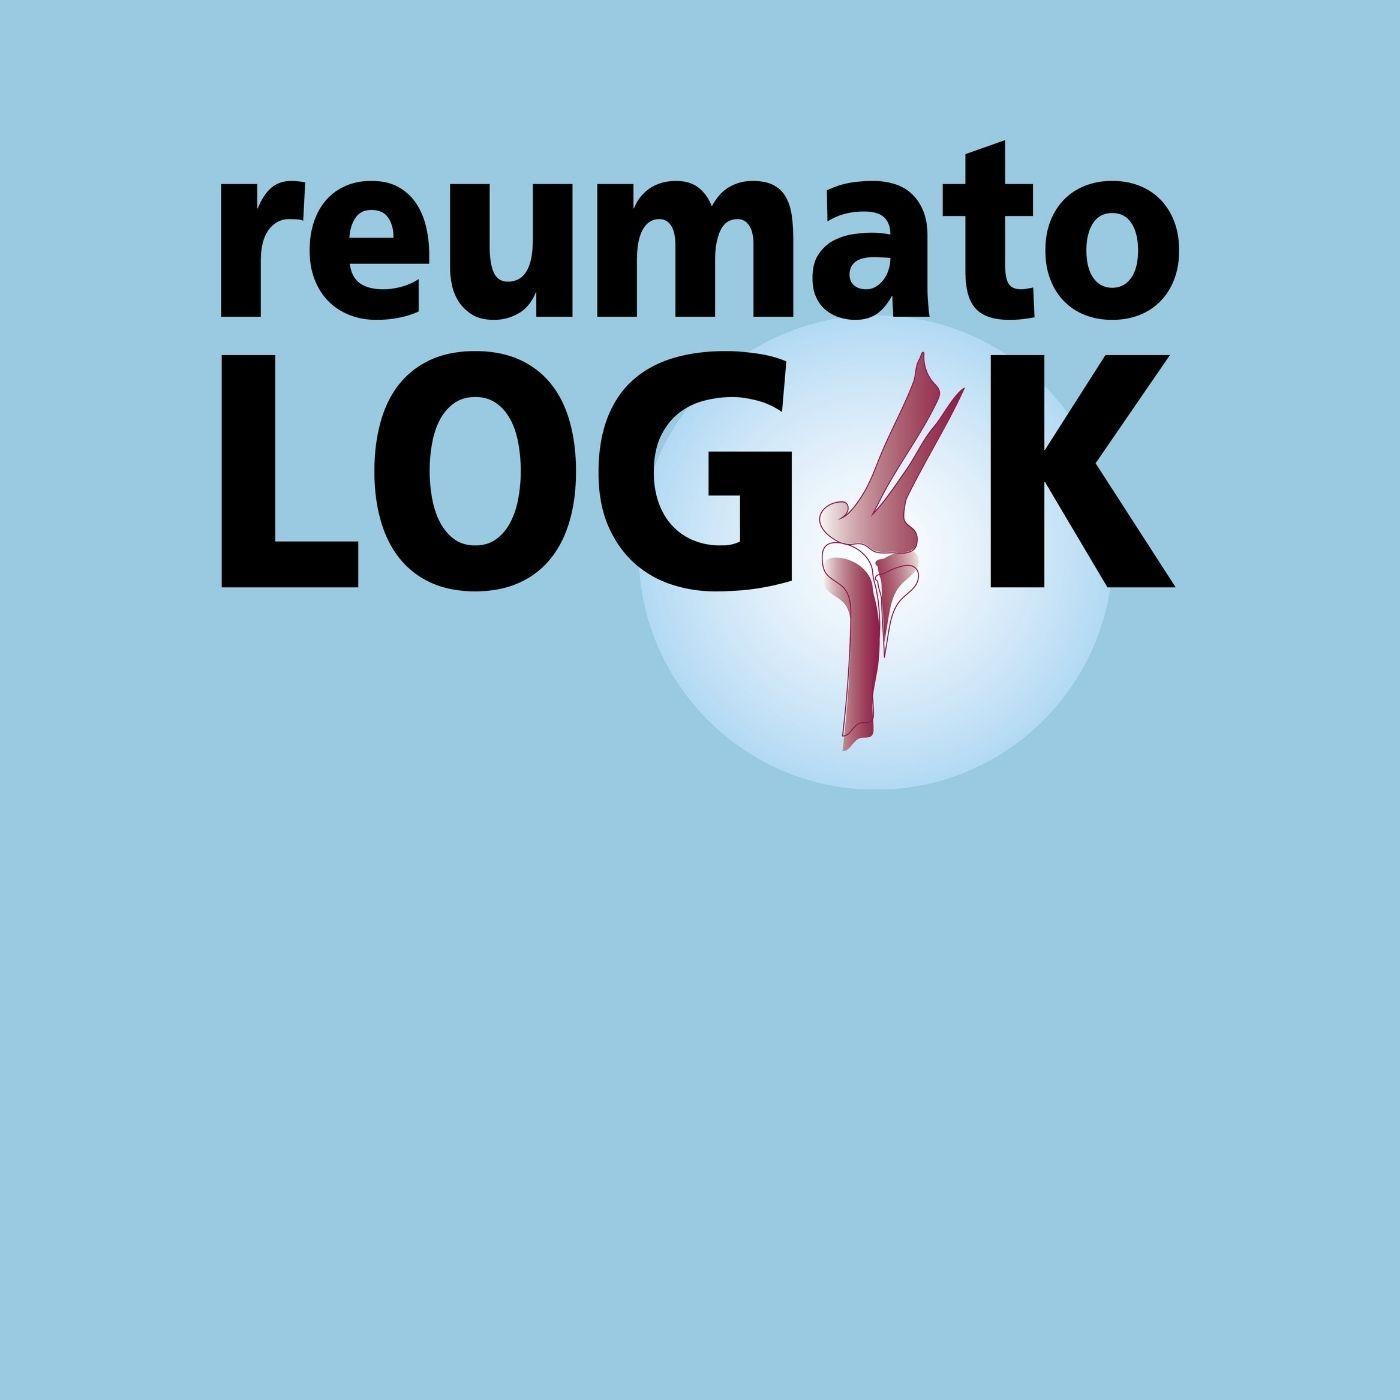 ReumatoLOGIK